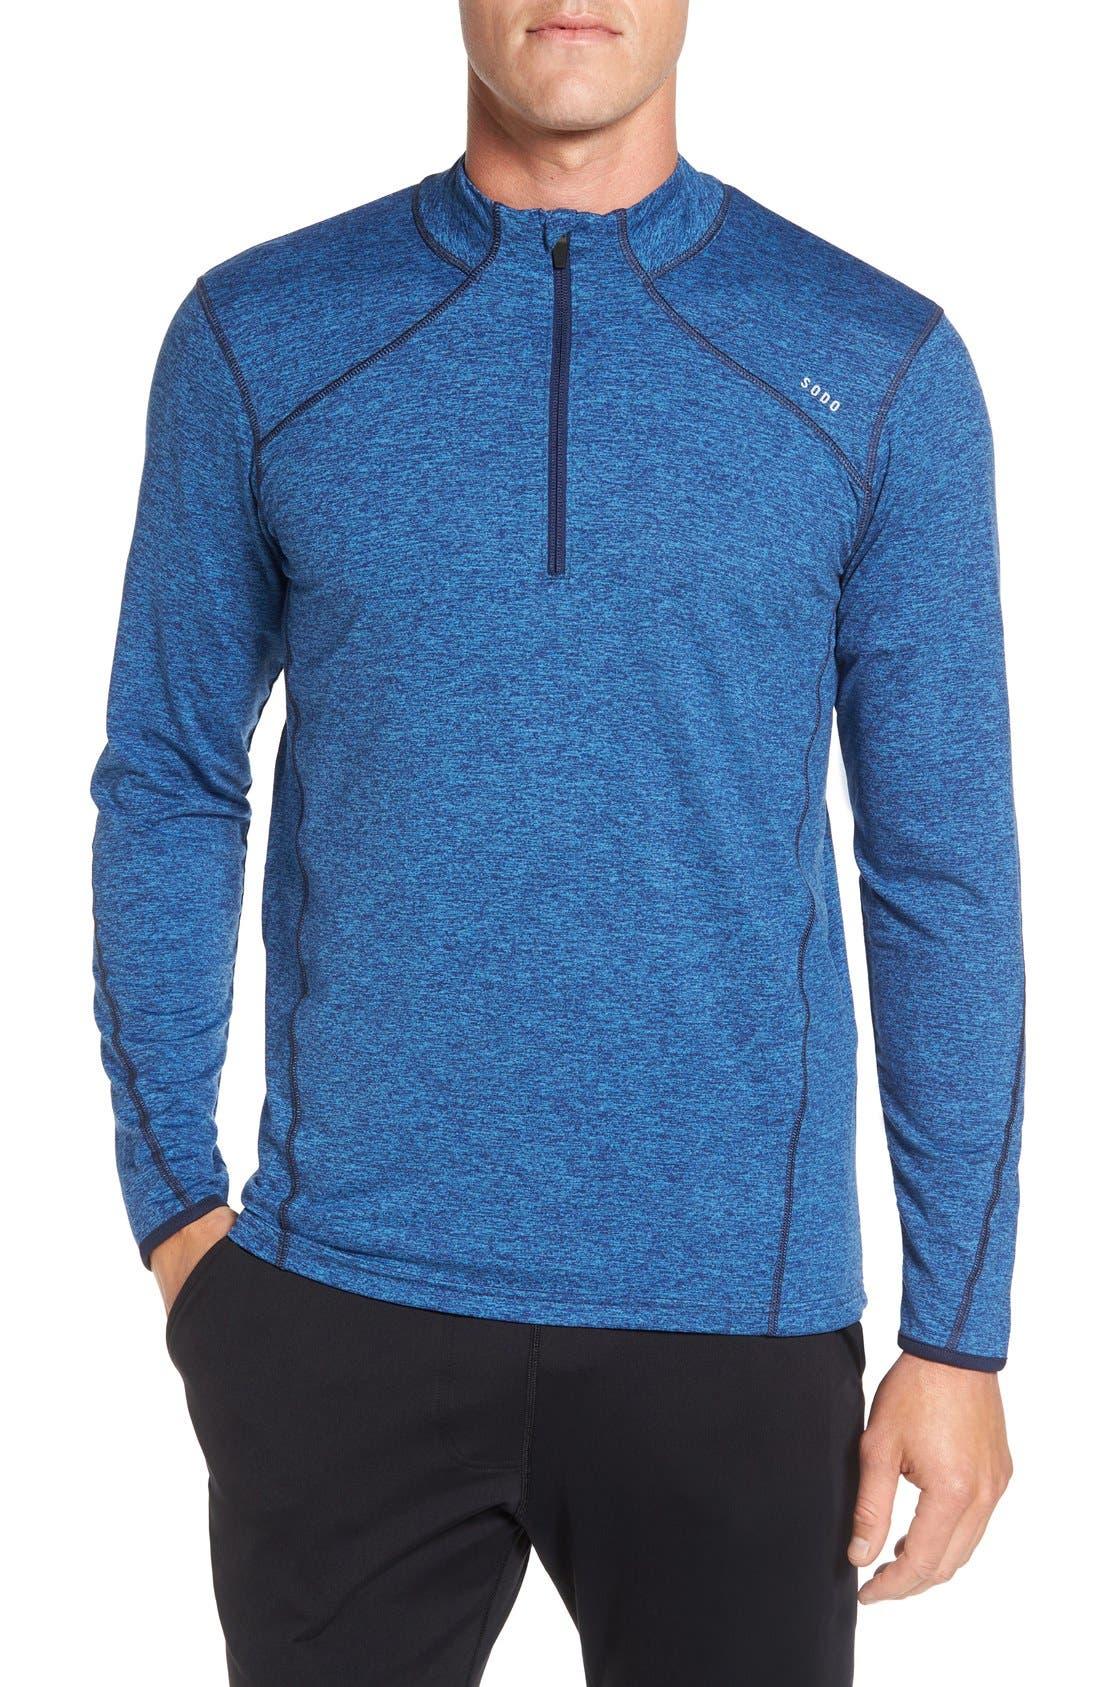 SODO 'Elevate' Moisture Wicking Stretch Quarter Zip Pullover, Main, color, OCEAN BLUE/ NAVY